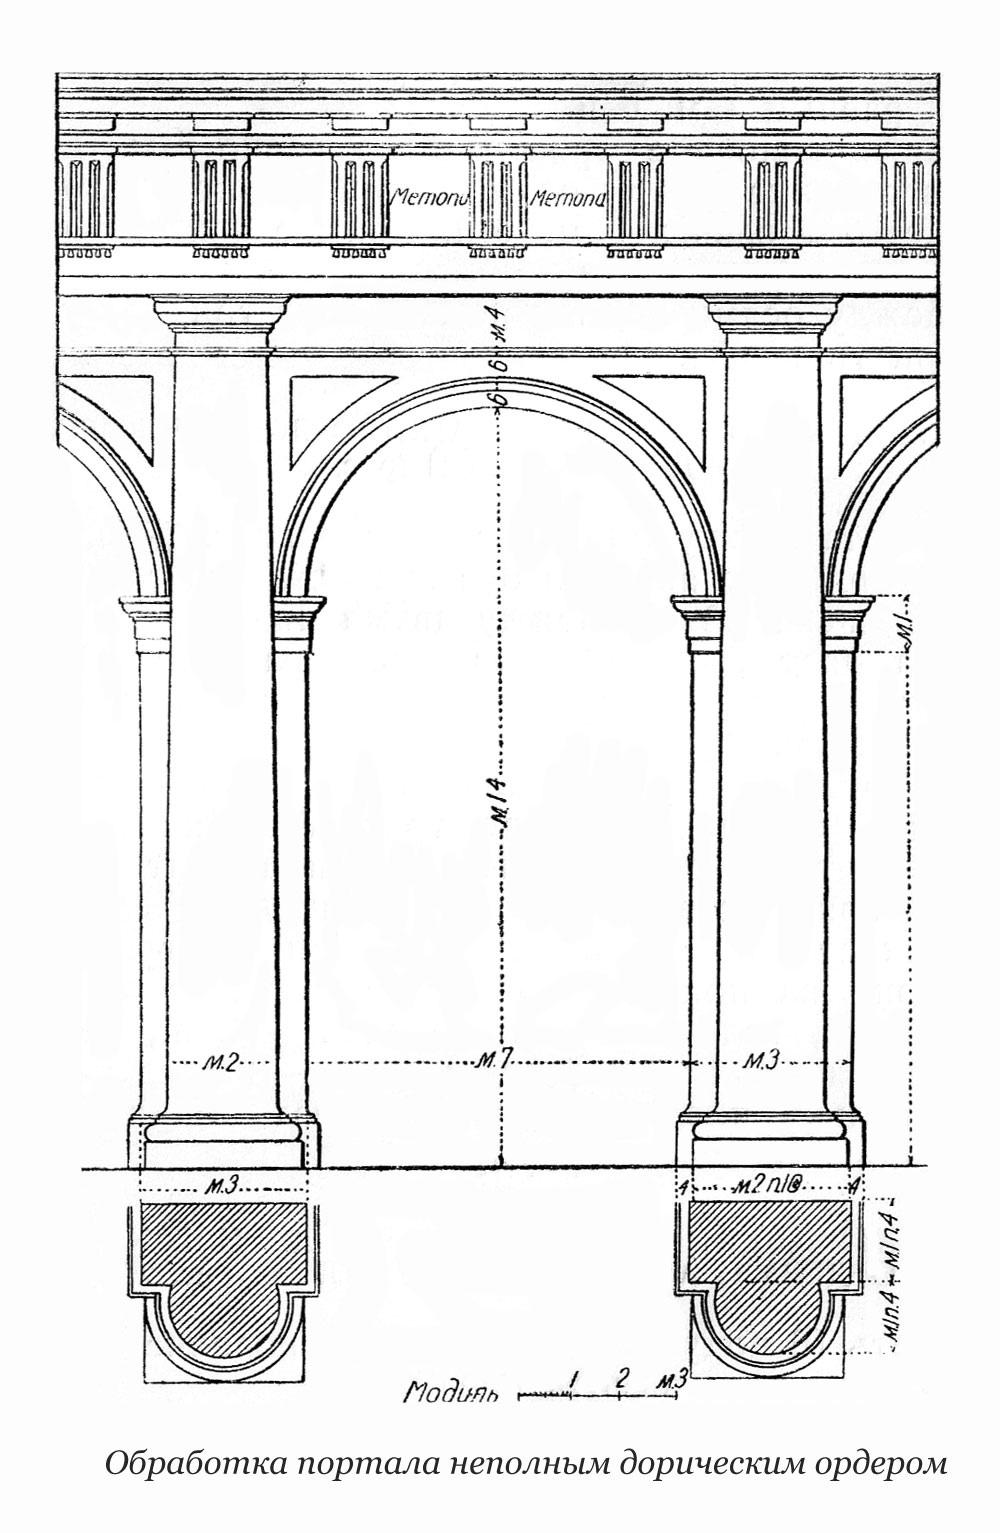 doric-order_colonnade-1